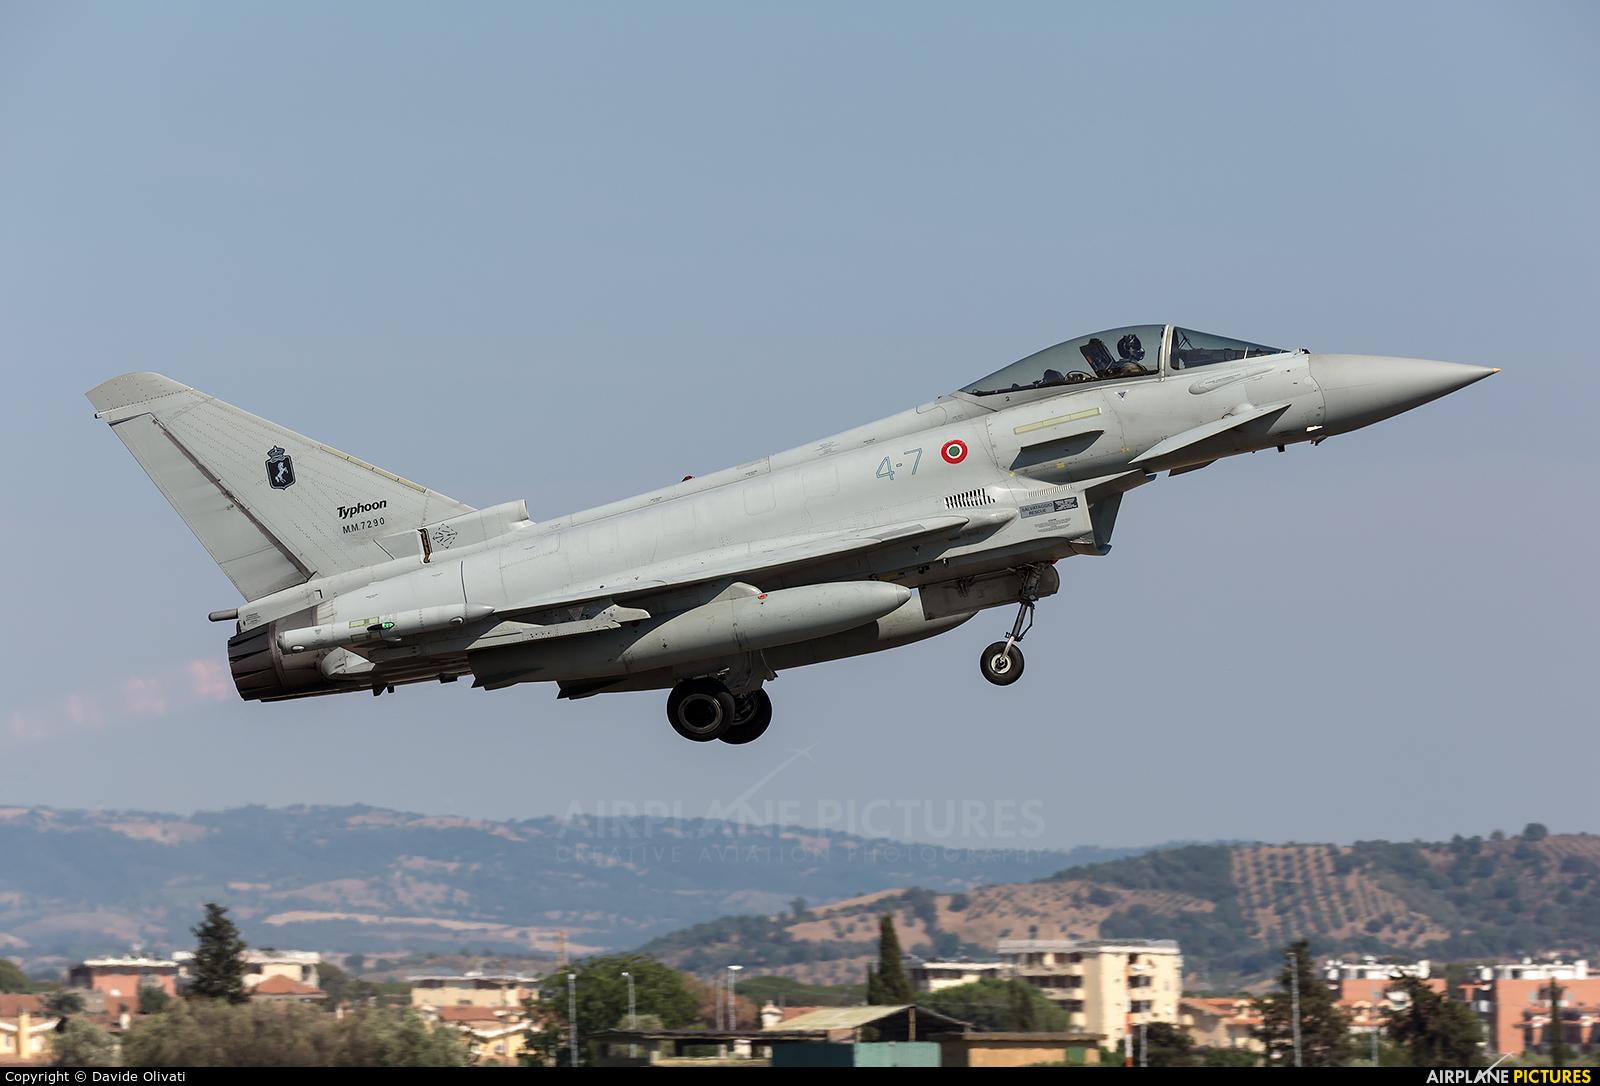 Italy - Air Force MM7290 aircraft at Grosseto - Corrado Baccarini